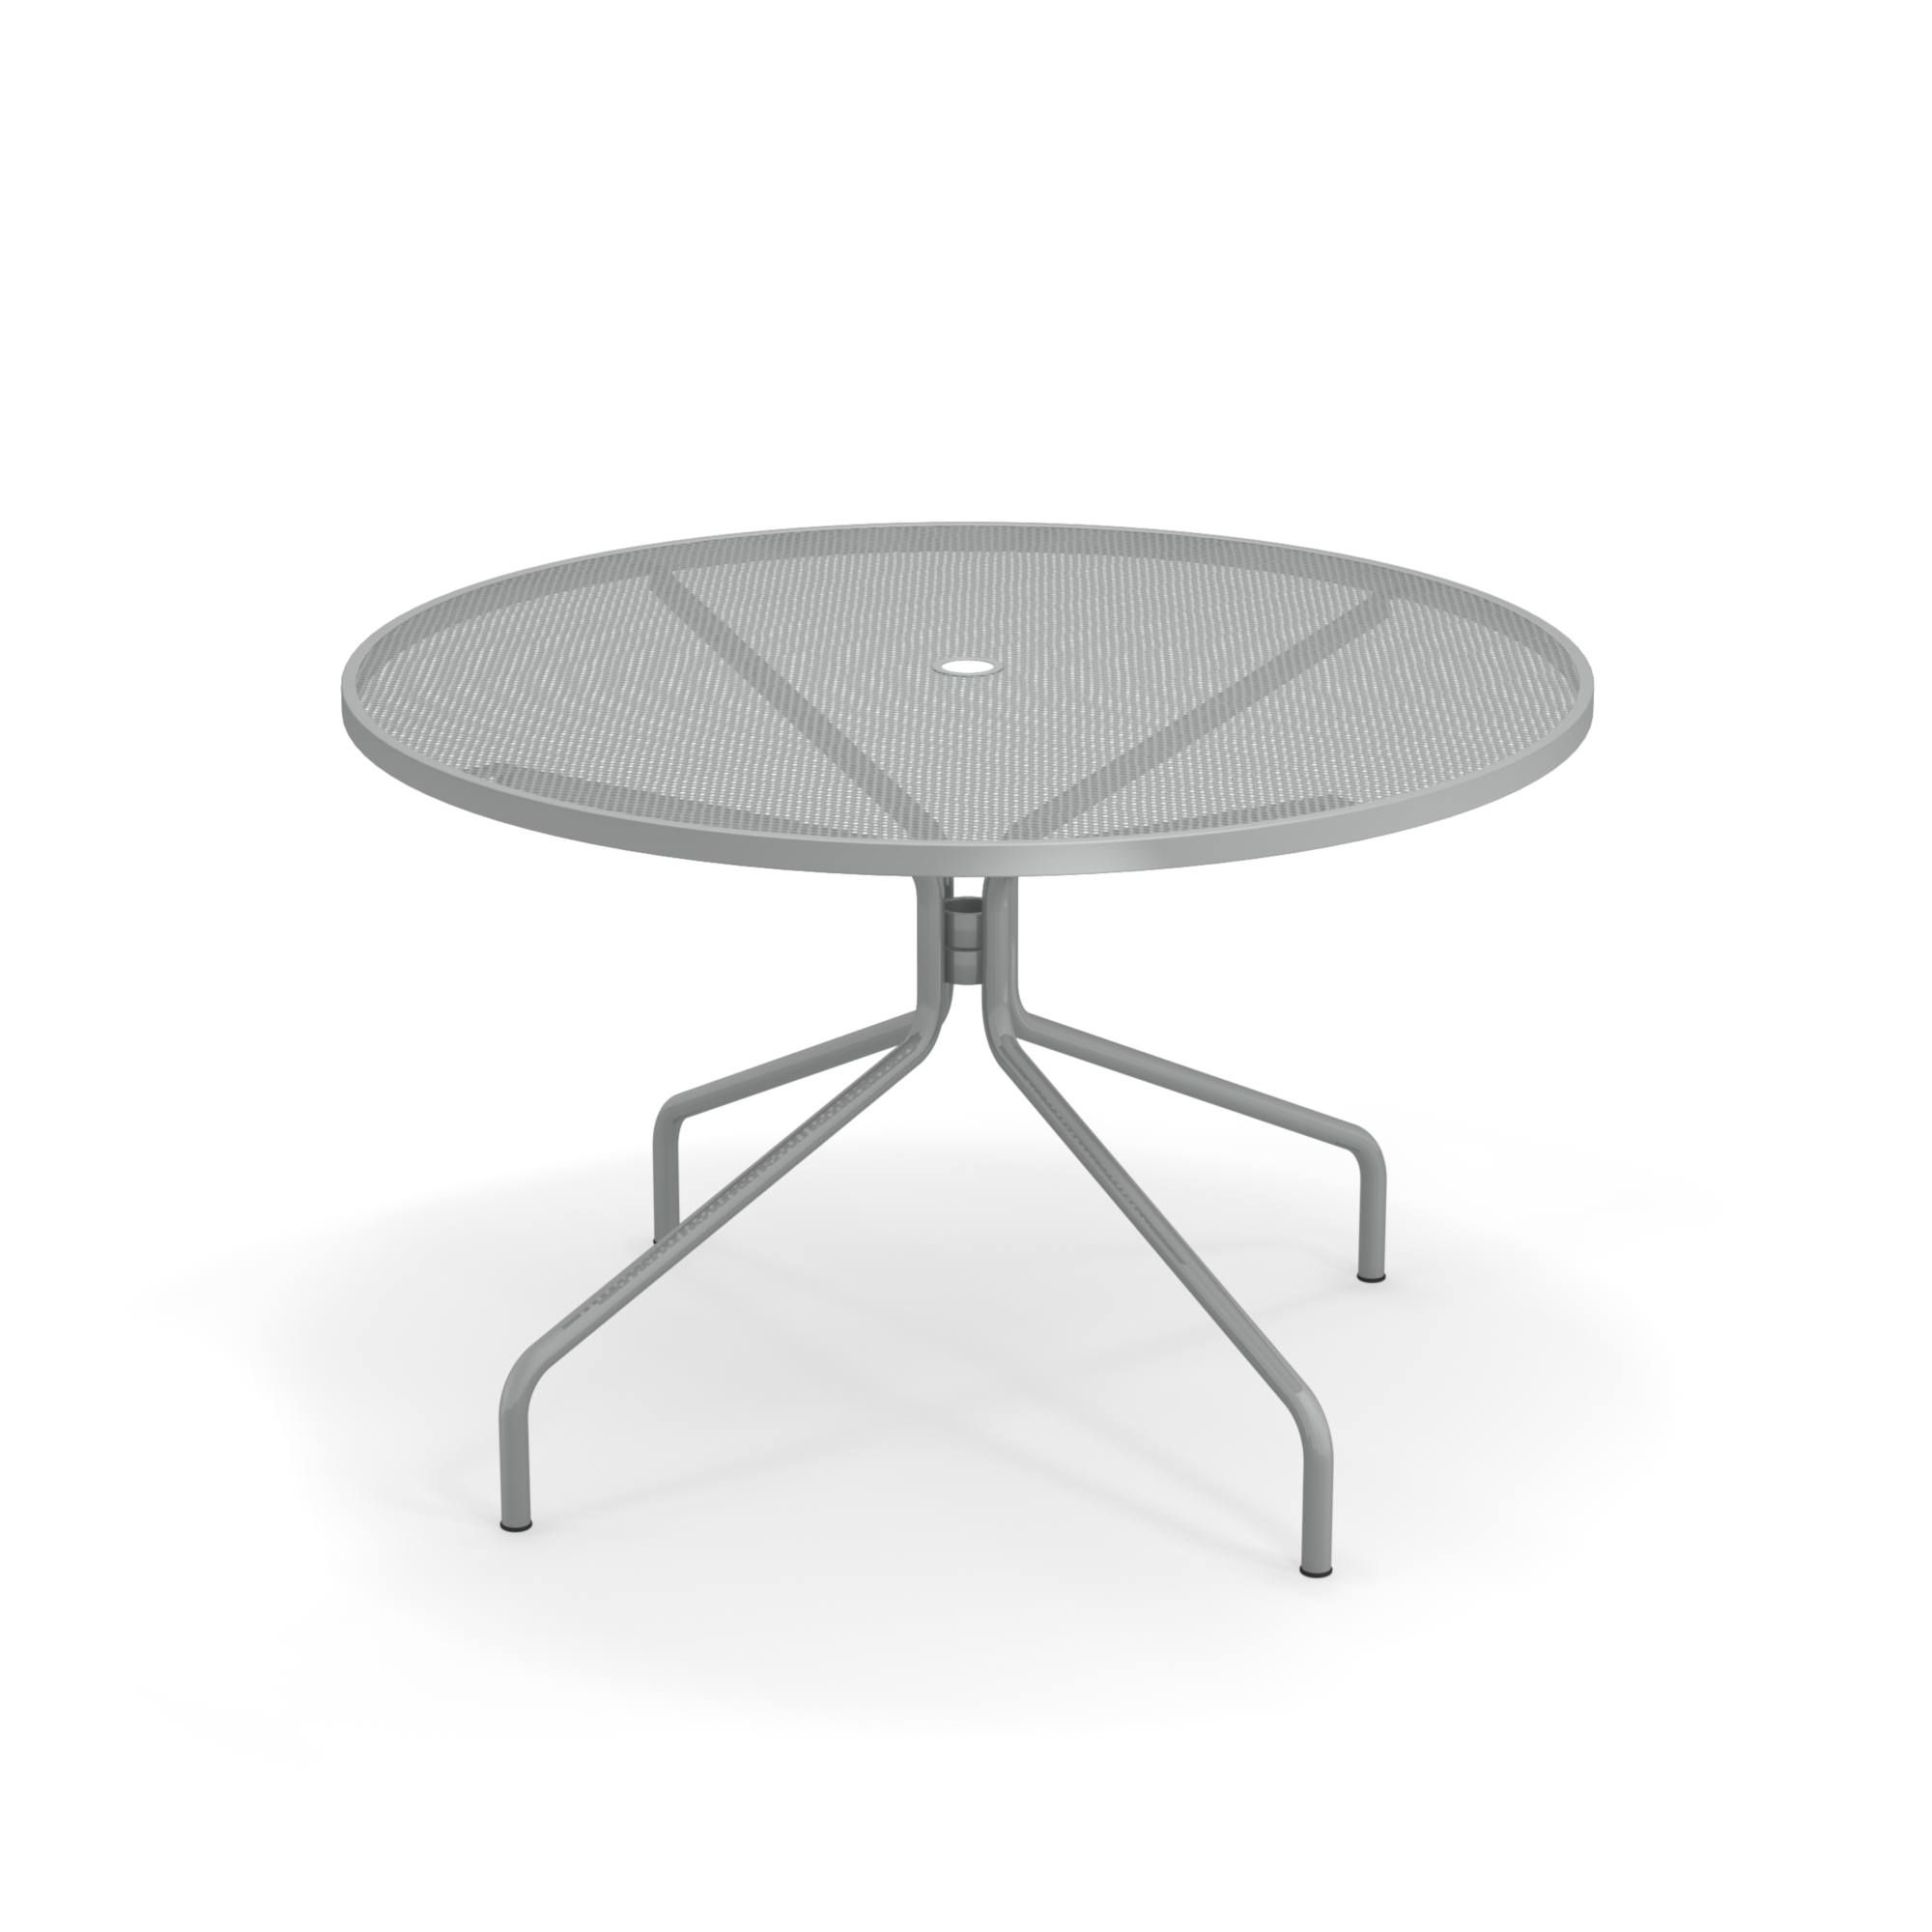 emuamericas, llc 805-20 table, outdoor